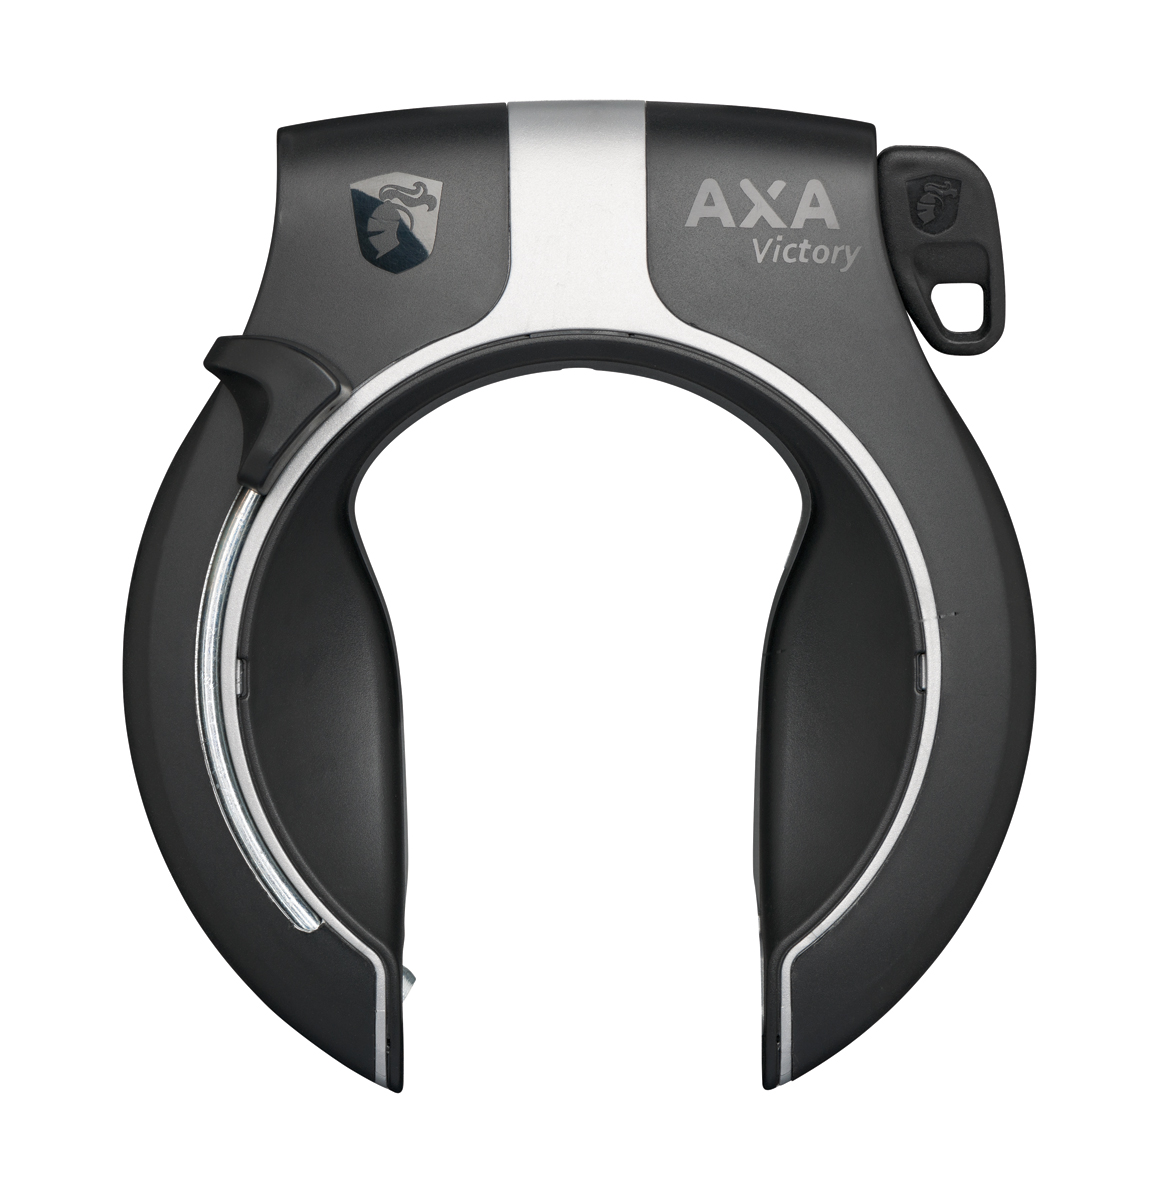 AXA Victory (black)